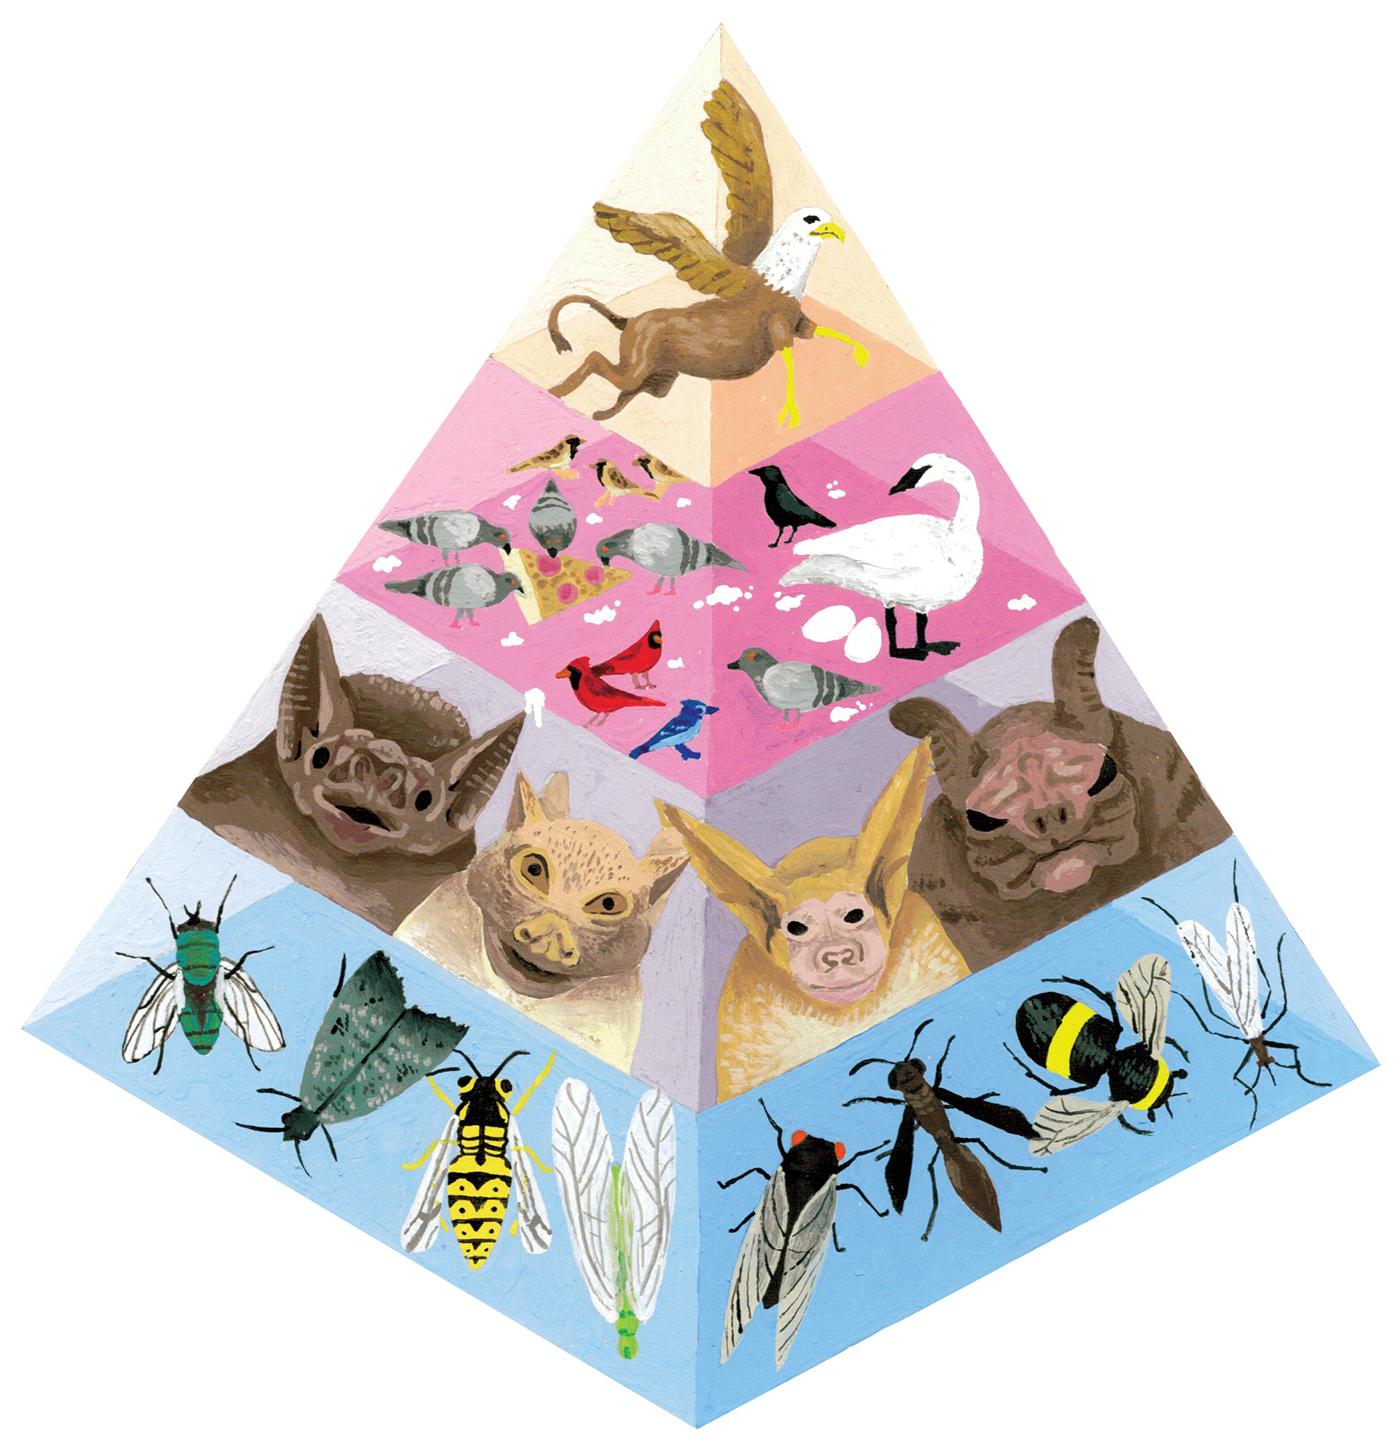 Adult Swim Food Chain Pyramids Pattern On Behance